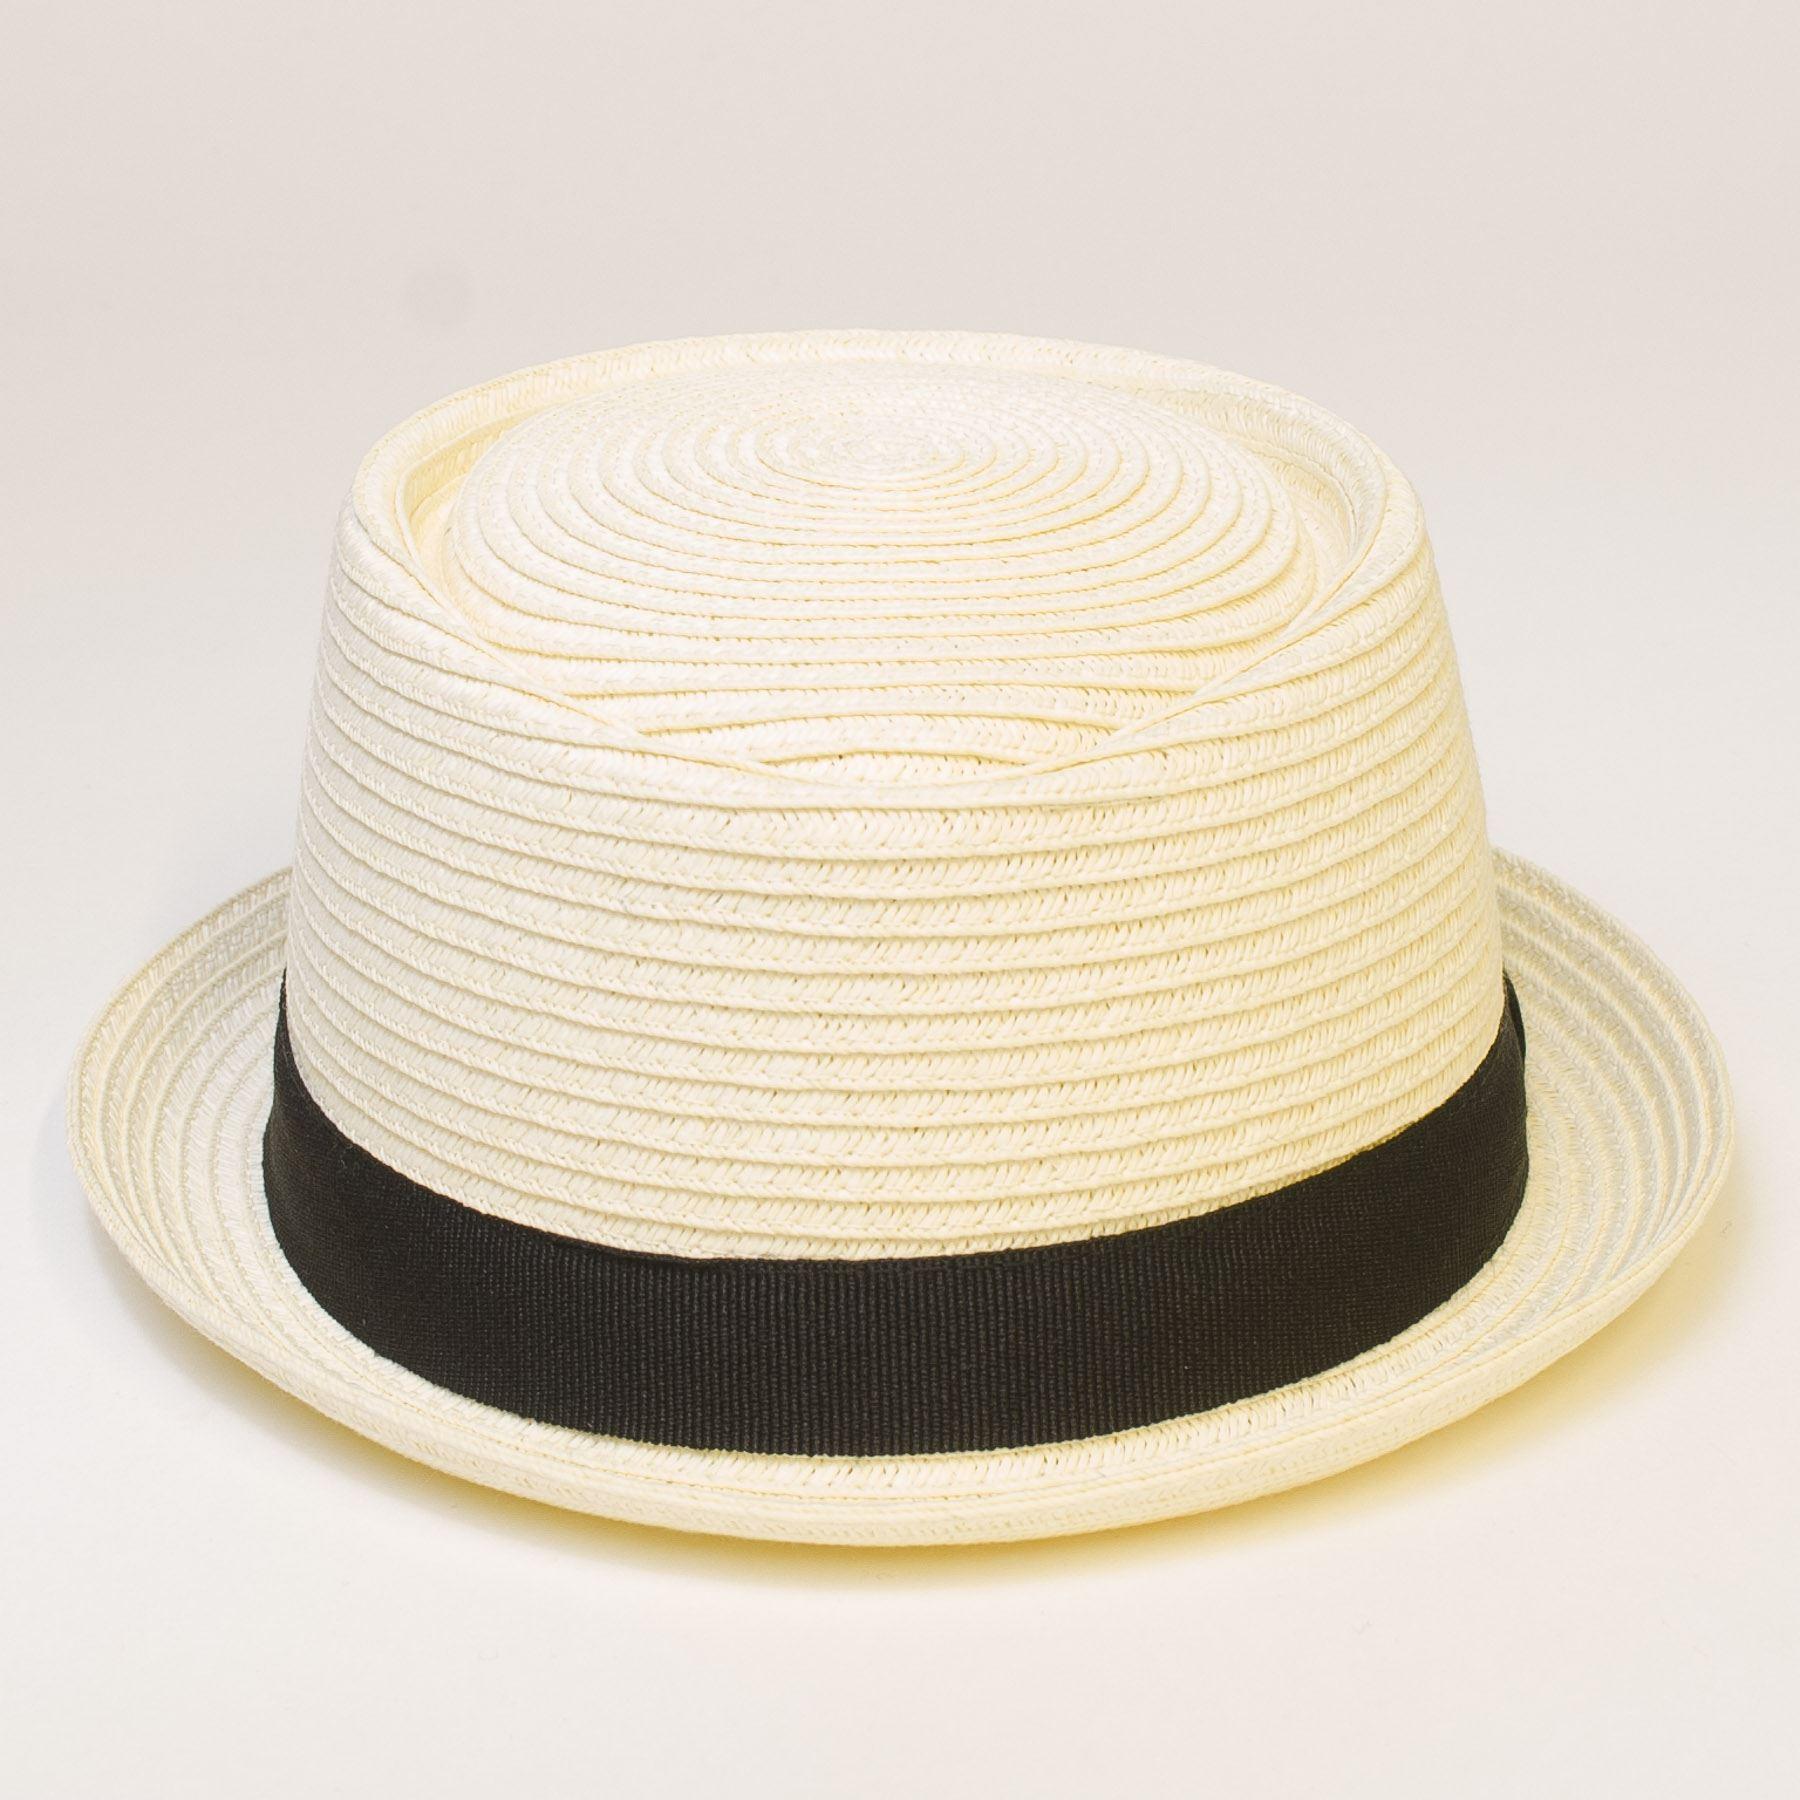 straw look pork pie hat ebay. Black Bedroom Furniture Sets. Home Design Ideas